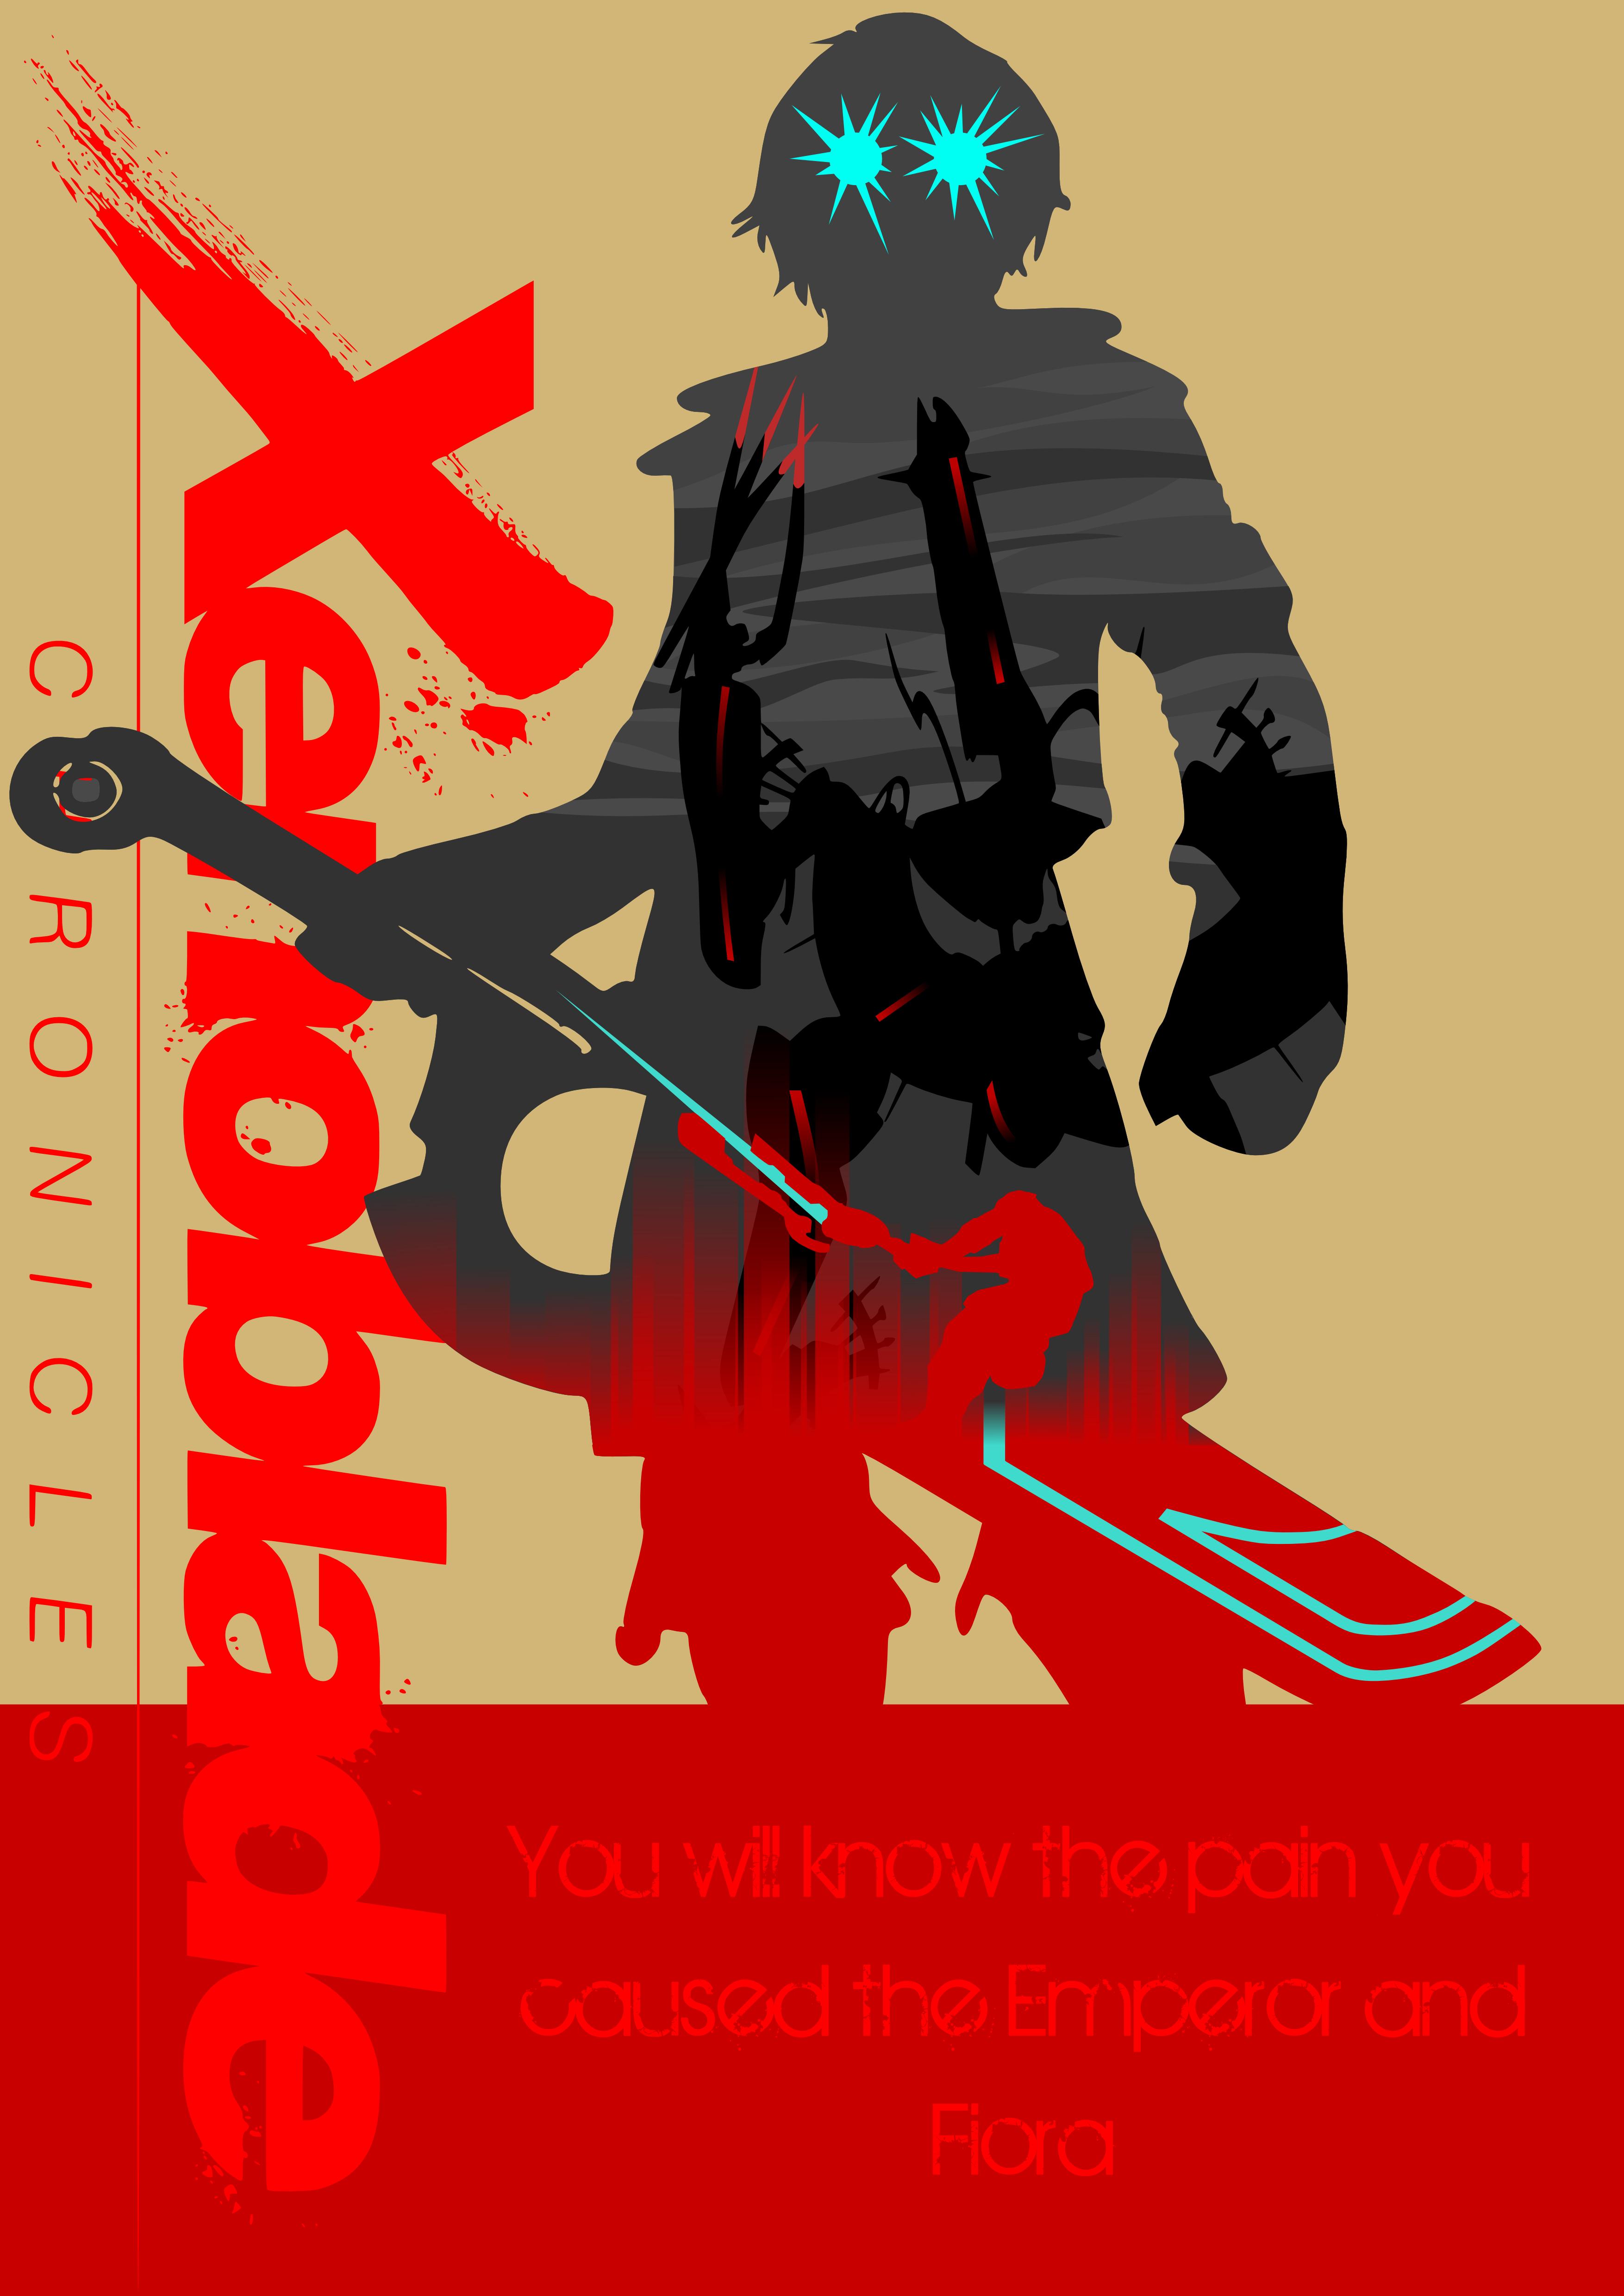 xenoblade chronicles shulk by arbezenoki-d847jhr pngXenoblade Chronicles Shulk